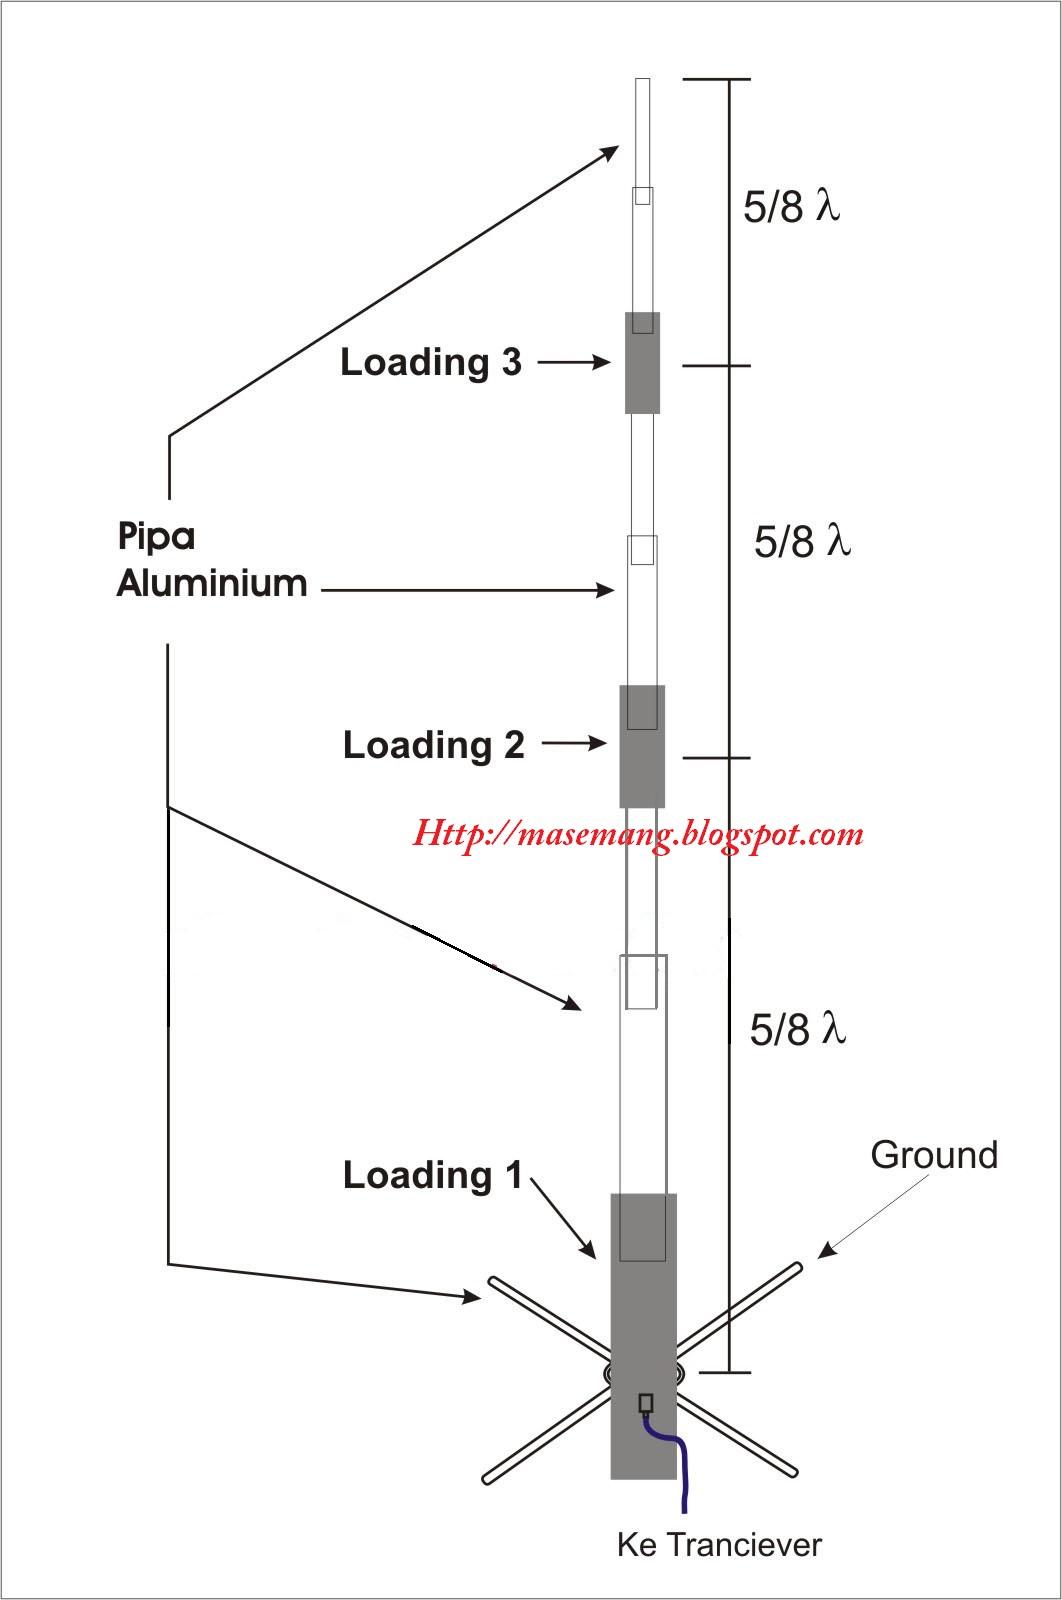 antena hastler jowo g6 g7 g9 jos gandos membuat antena g7 144 mhz. Black Bedroom Furniture Sets. Home Design Ideas